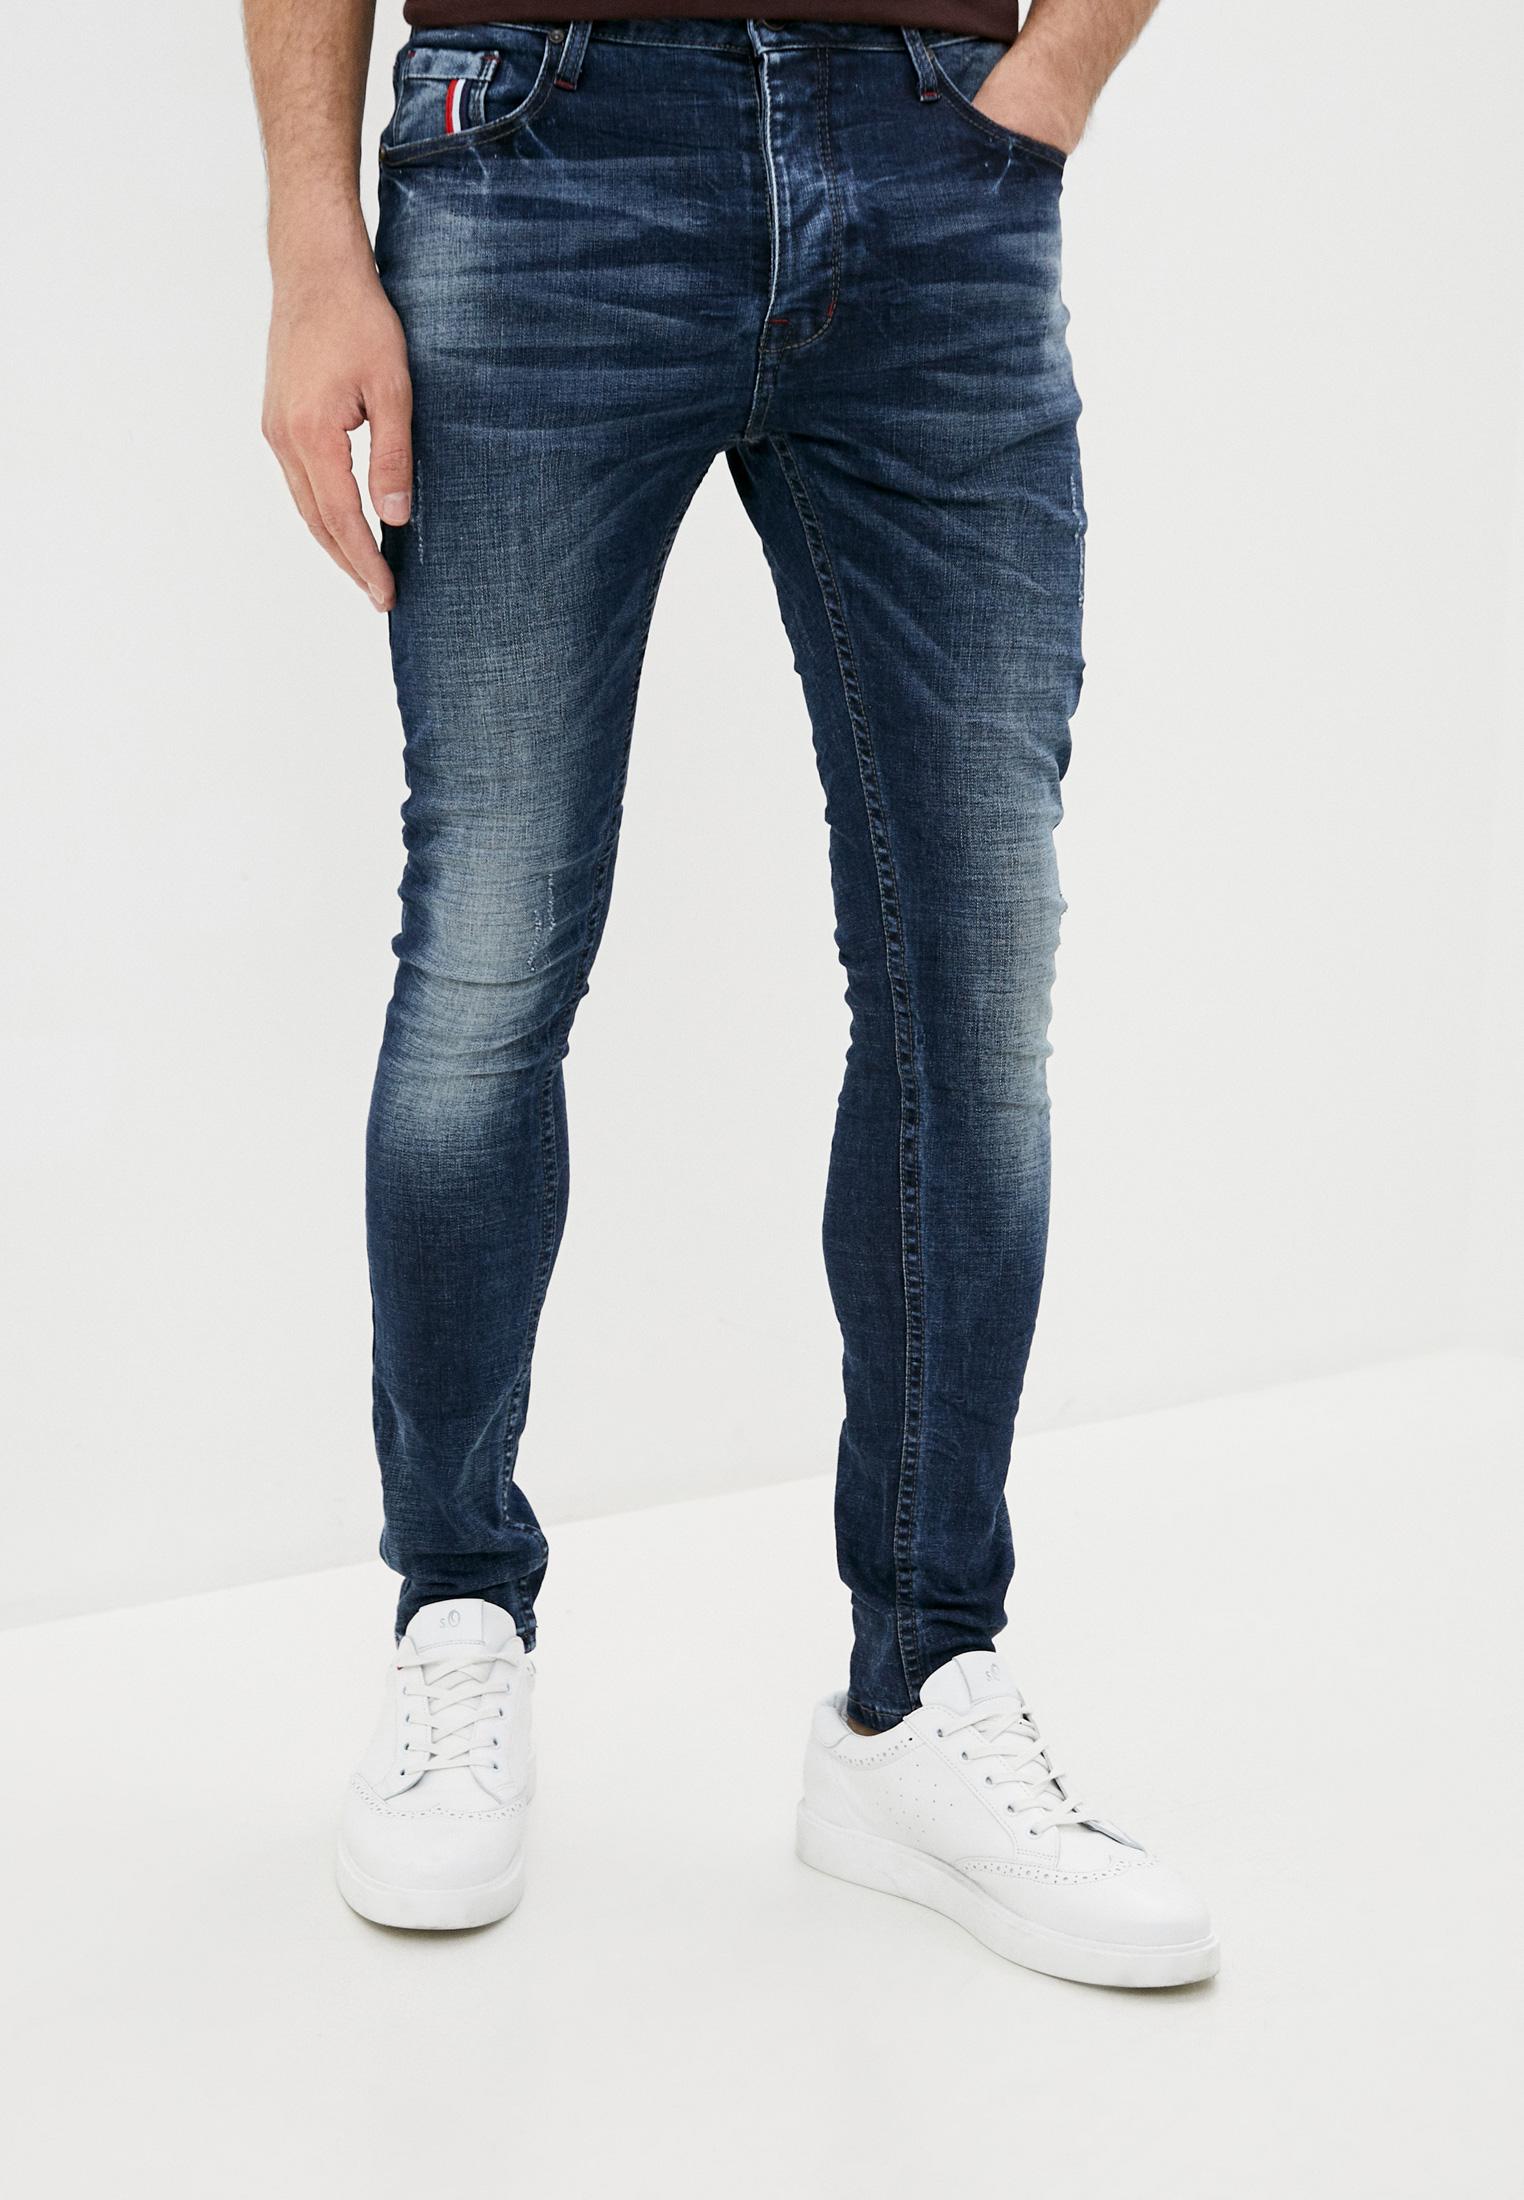 Зауженные джинсы Terance Kole 66076